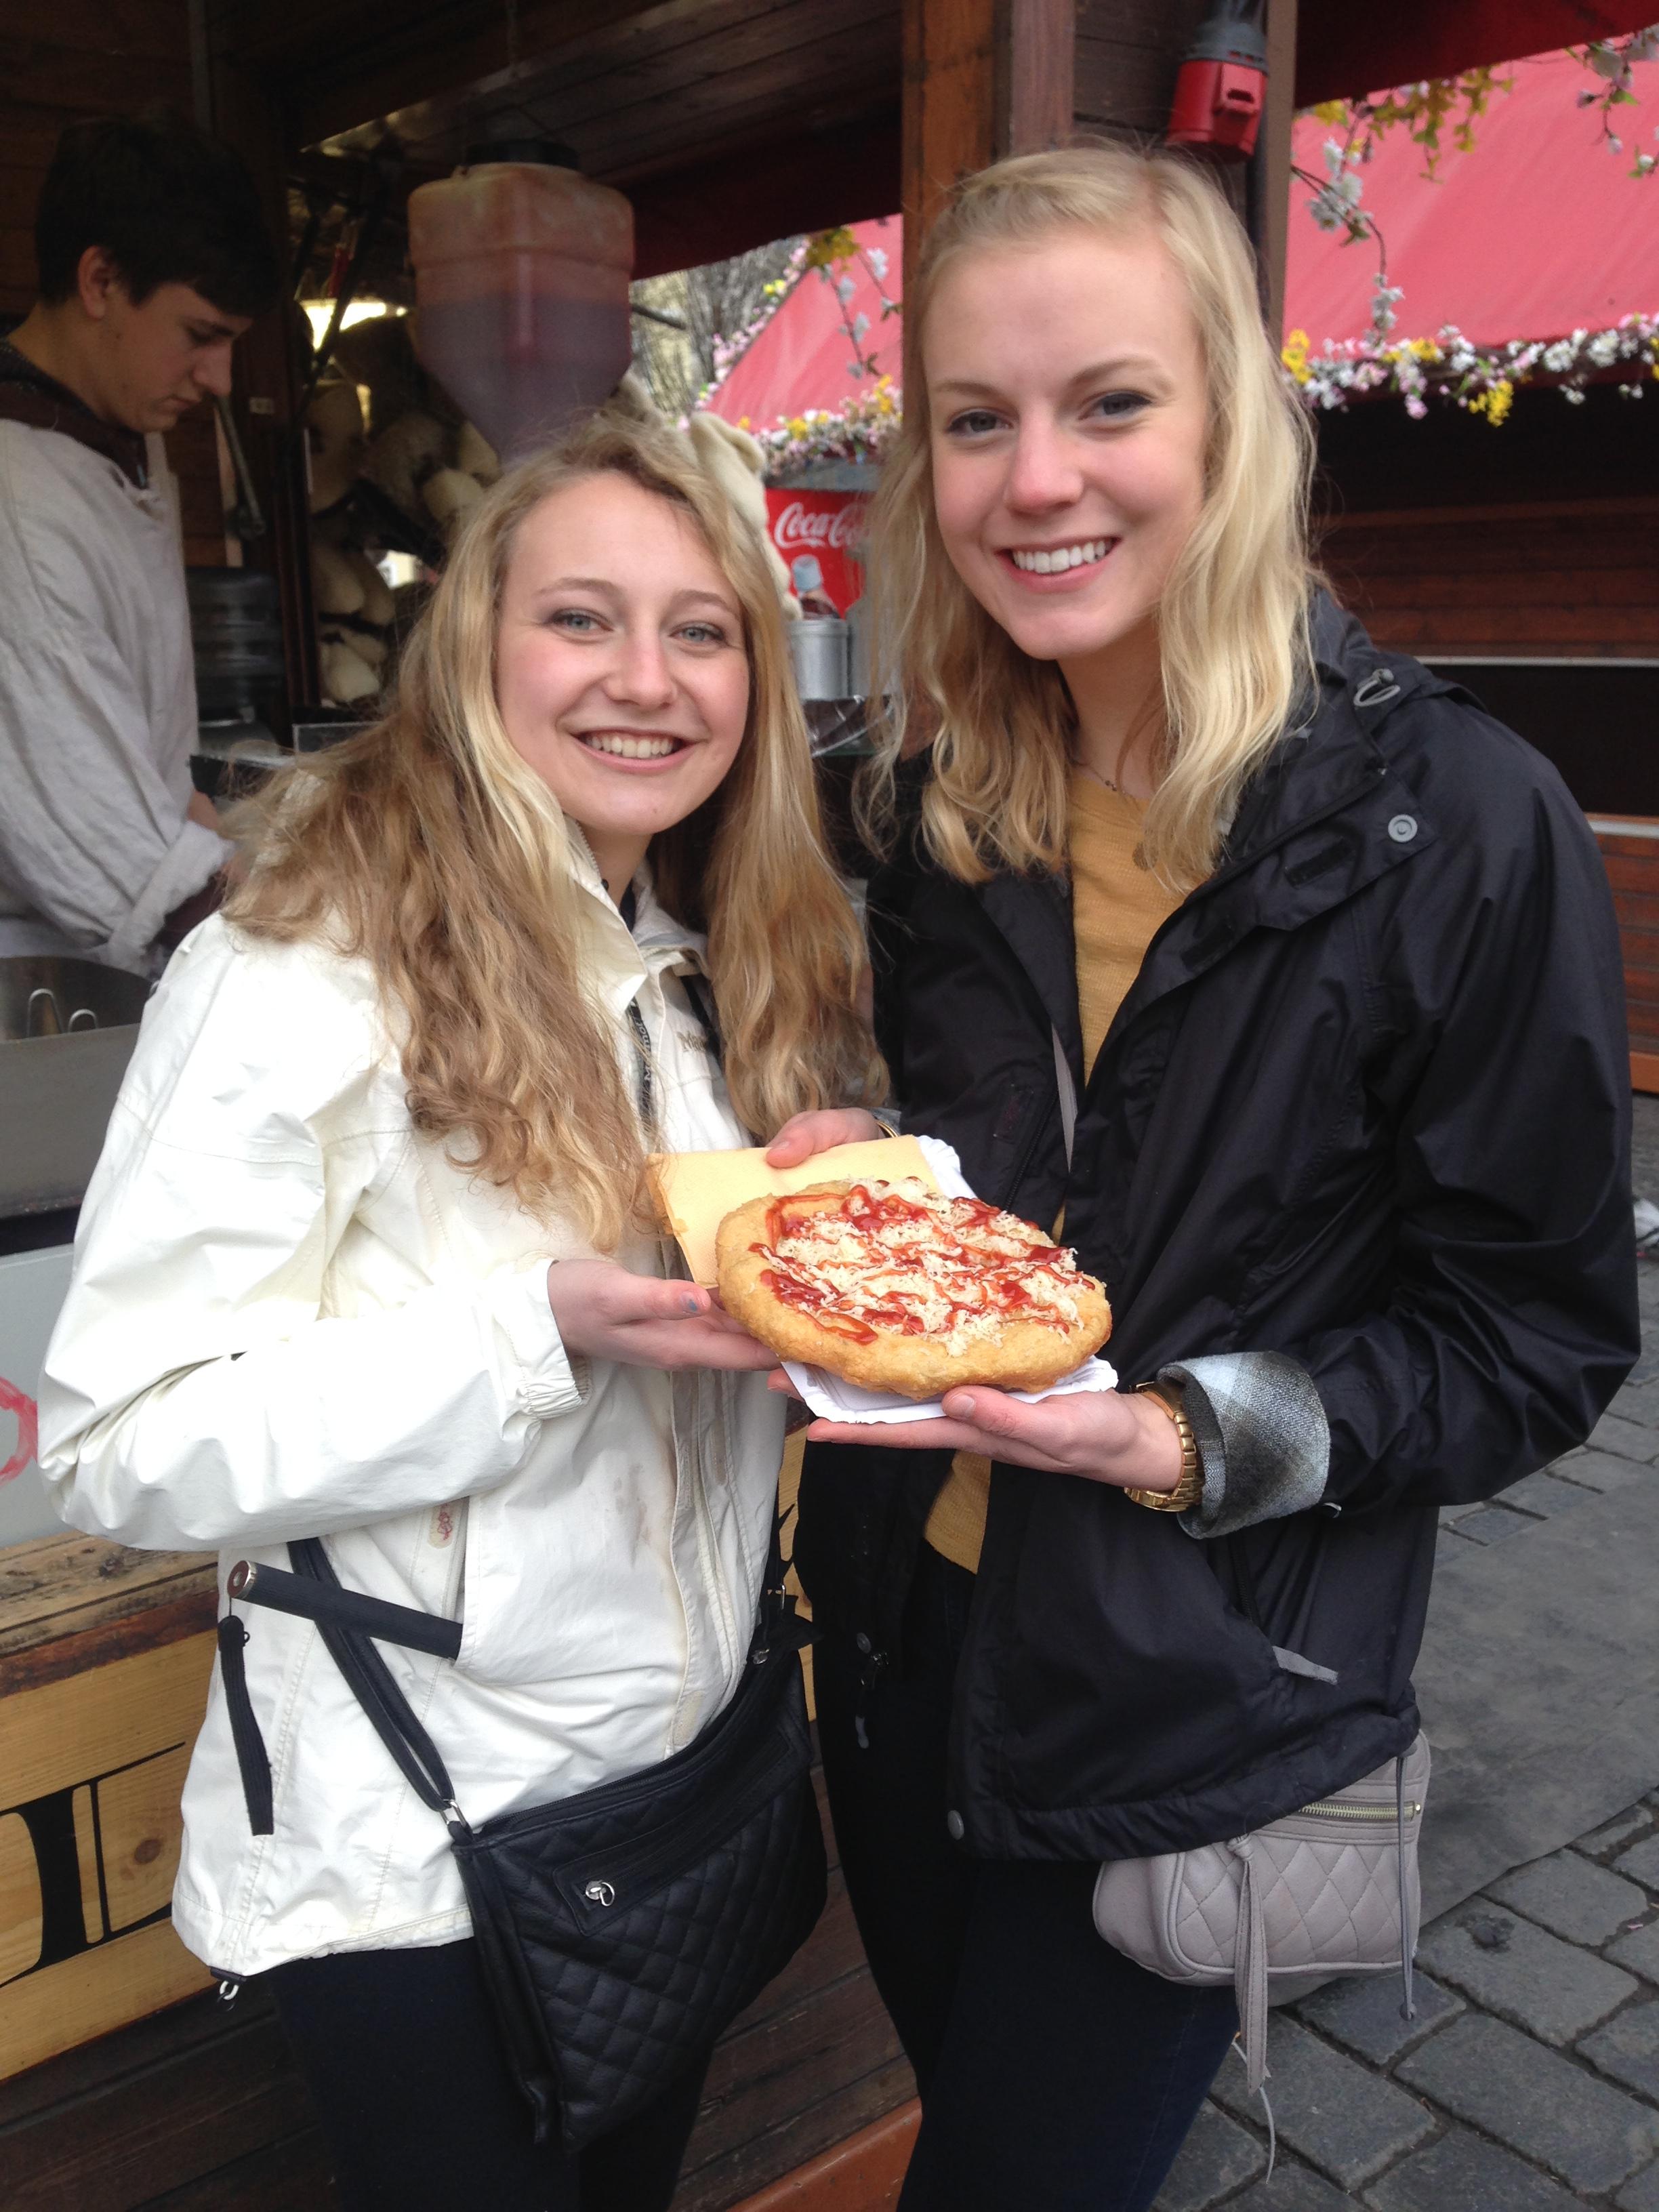 We heart street pizza!